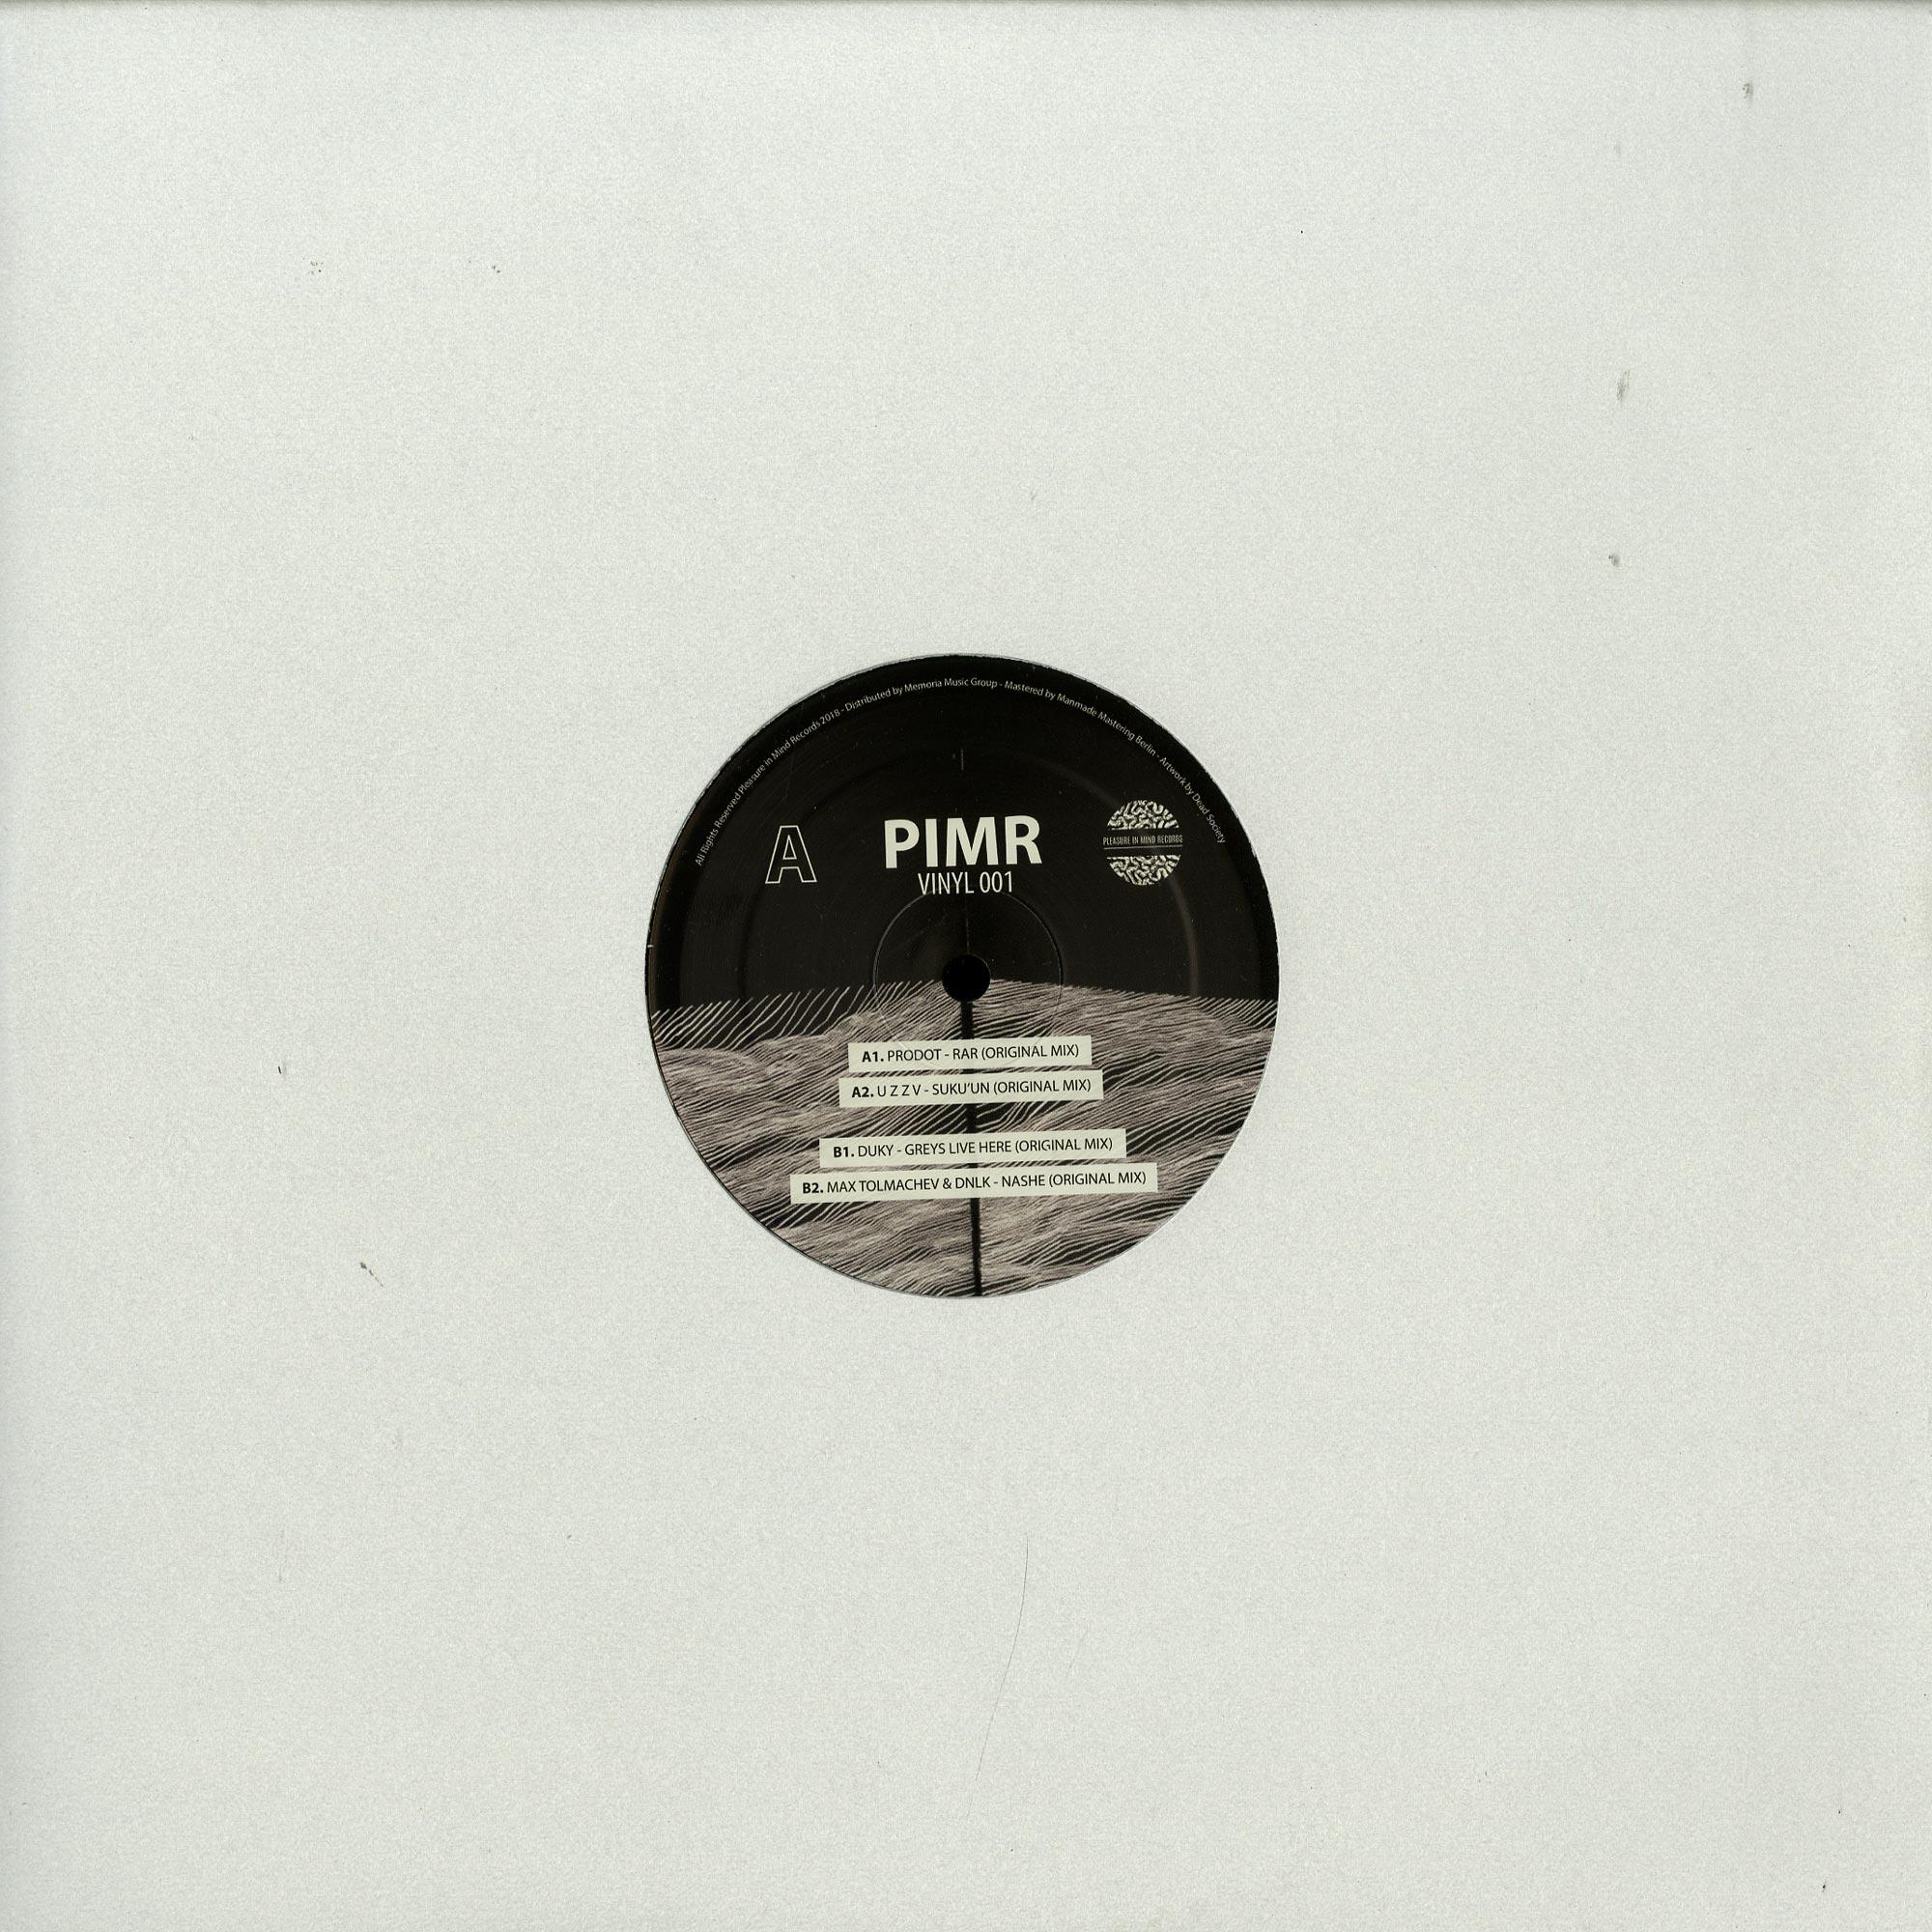 Prodot / u z z v / Duky / Max Tolmachev & Dnlk - PIMR VINYL 001